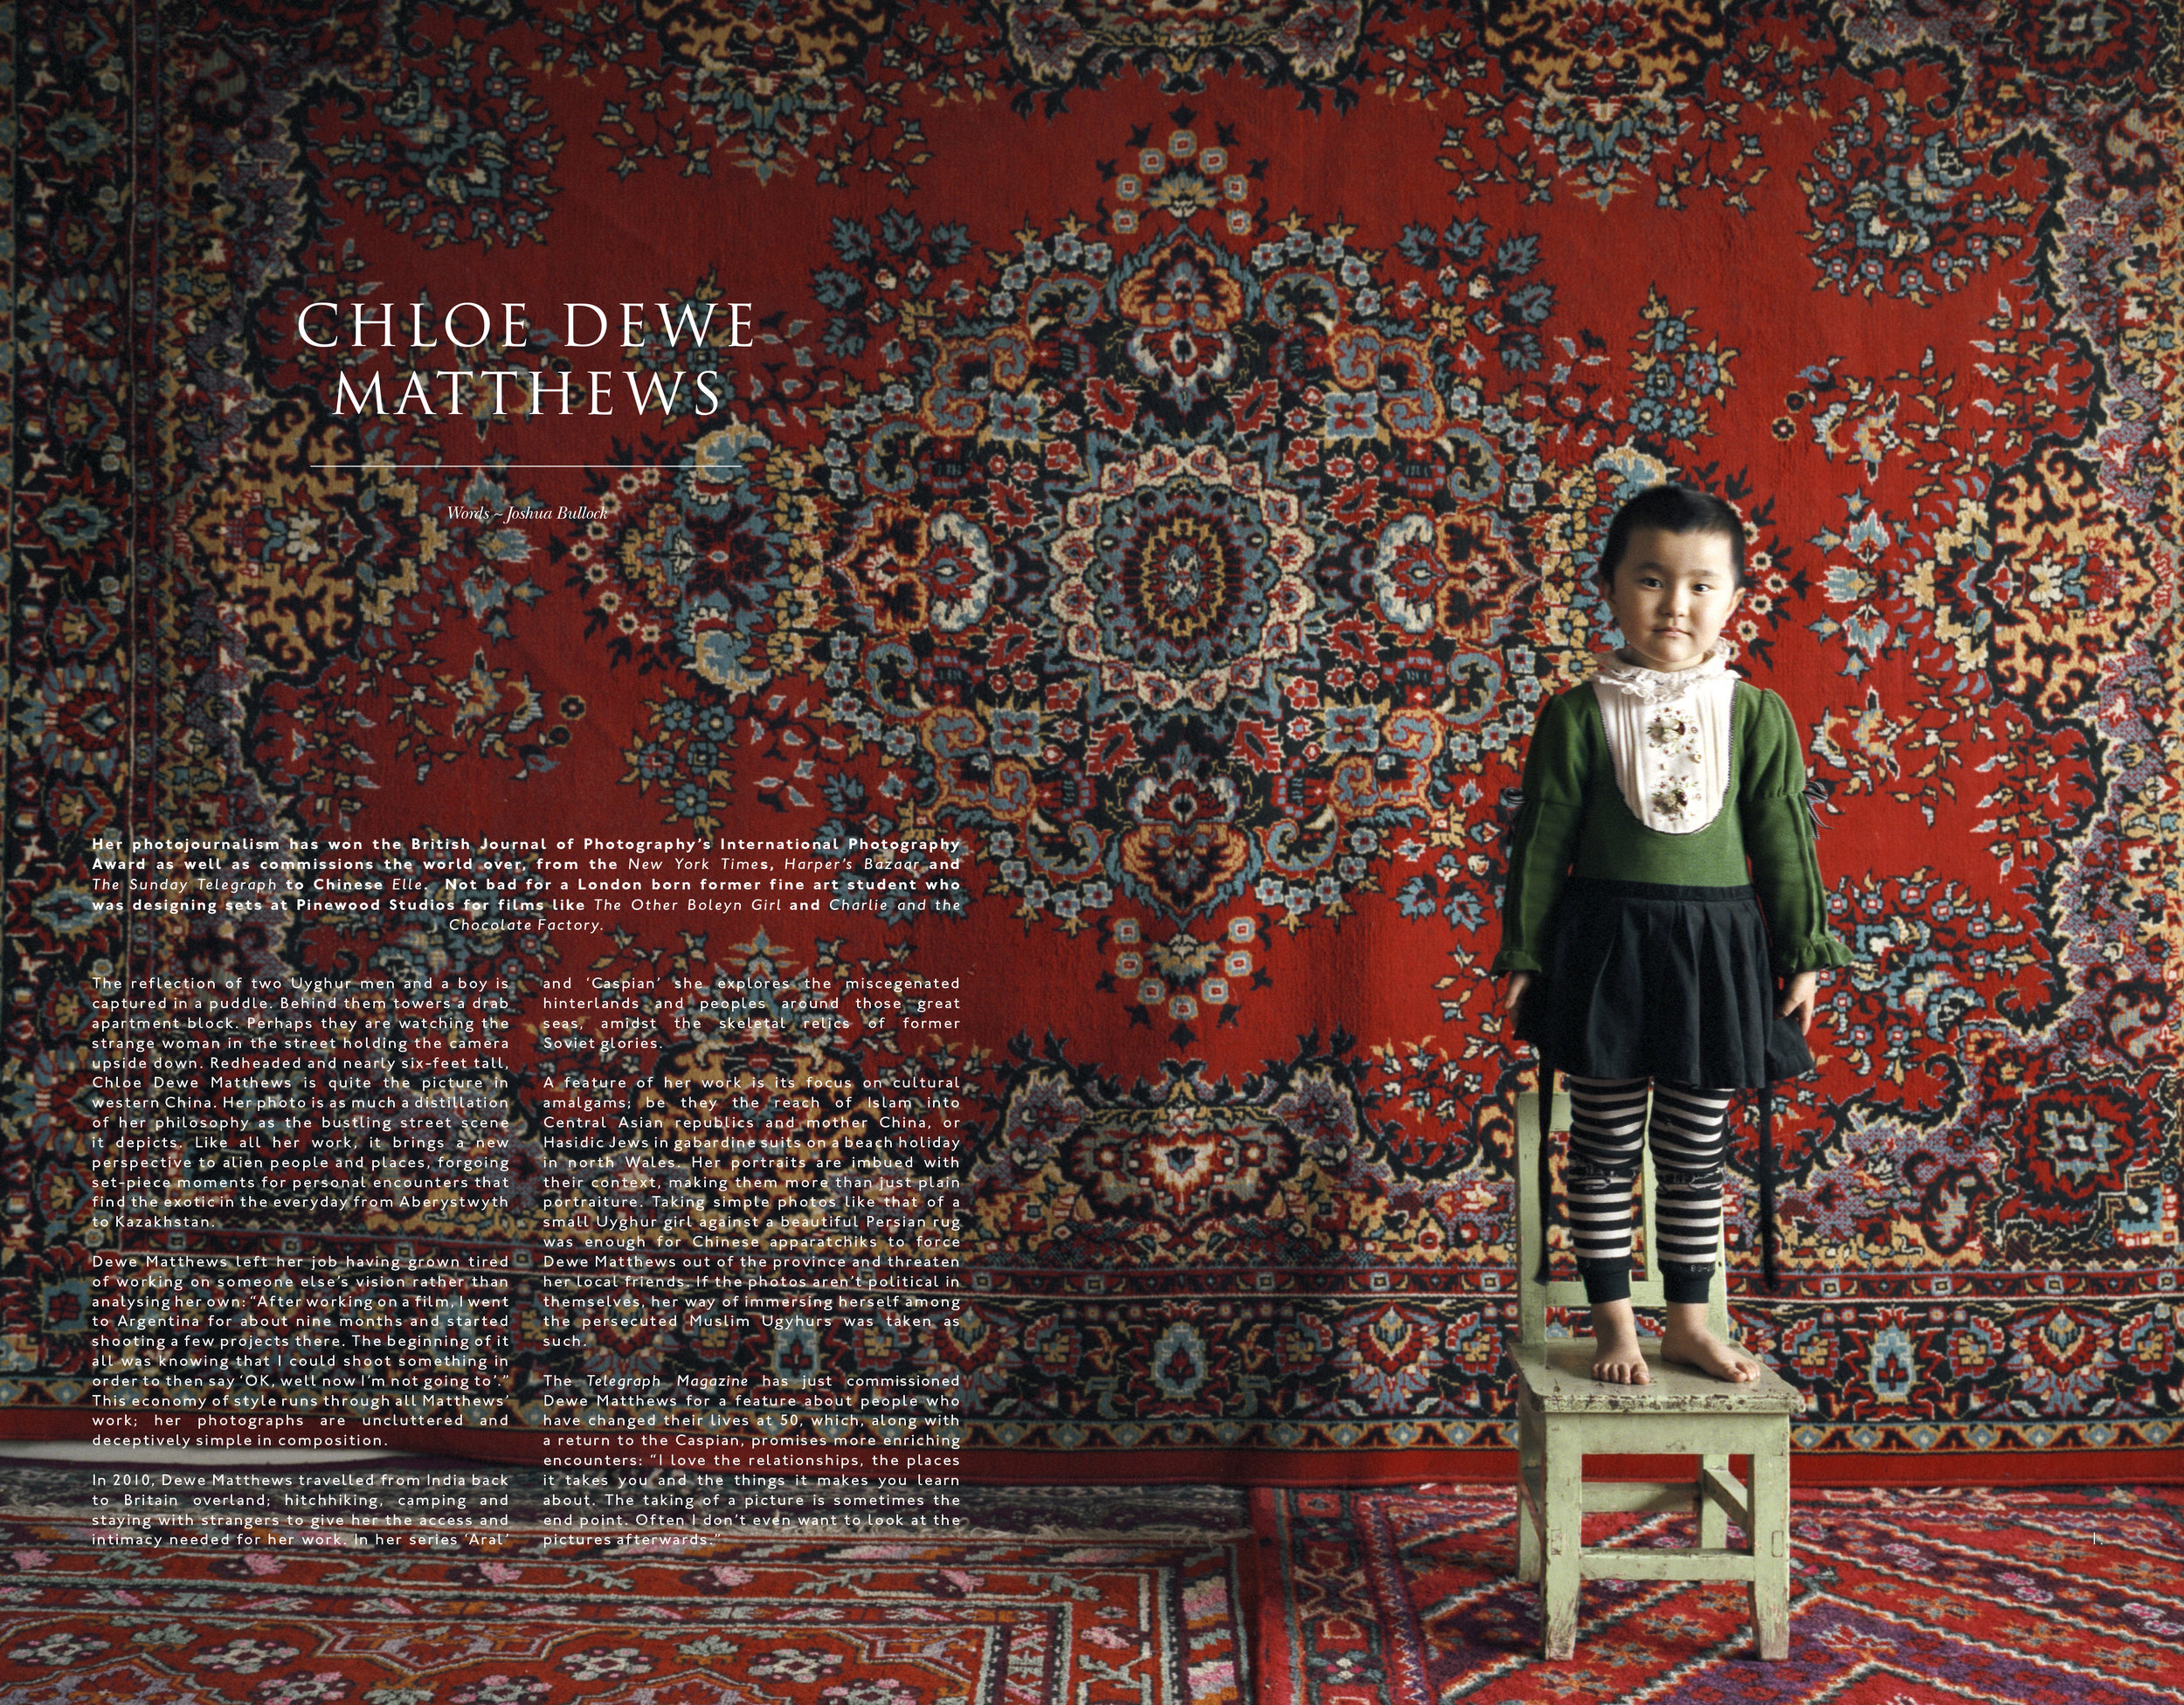 Chloe-Dewe-Matthews-copy-1.jpg